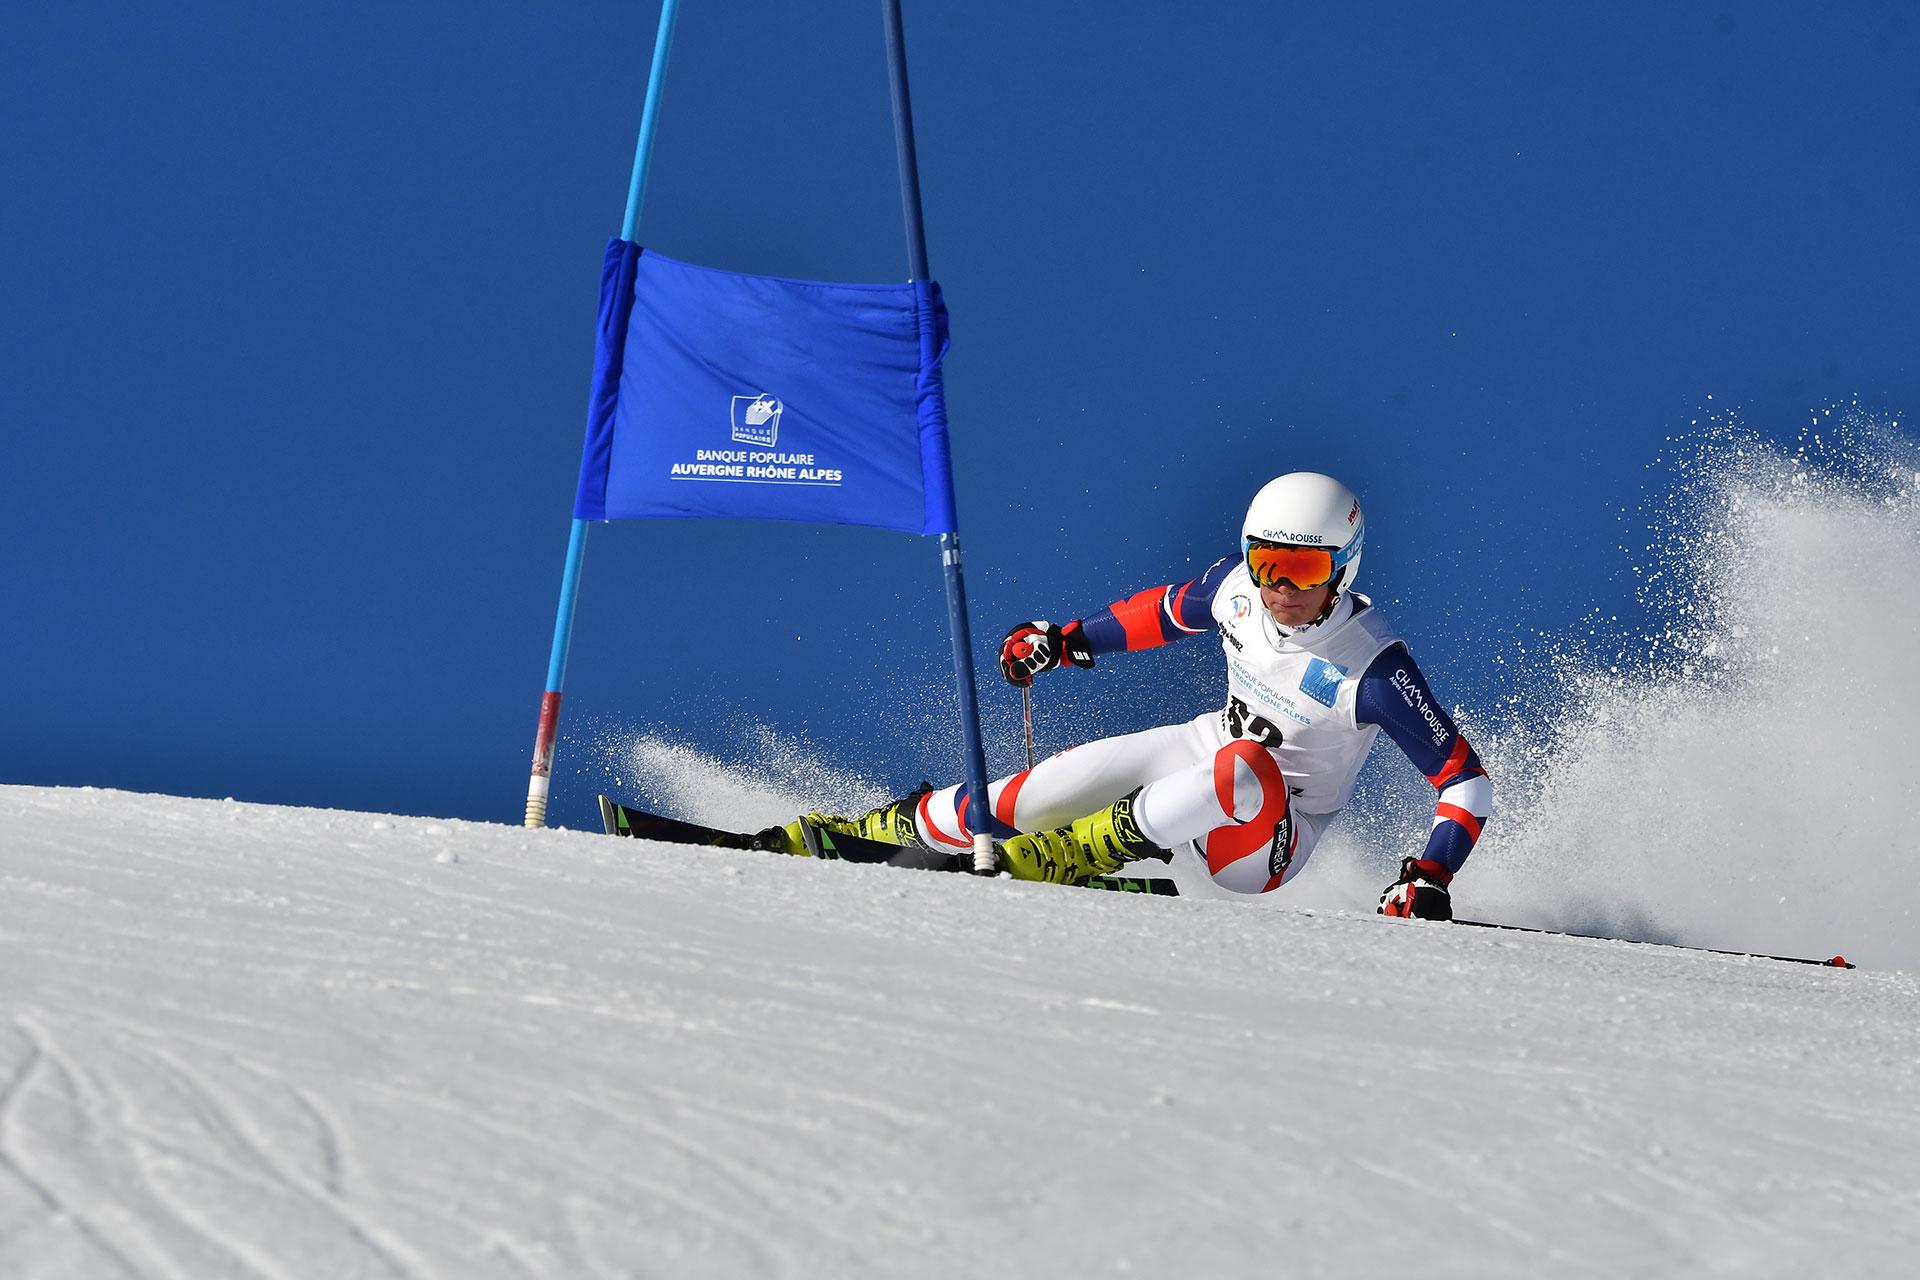 Chamrousse champion alban elezi cannaferina ski alpin slalom station montagne ski isère france - © Alban Elezi Cannaferina